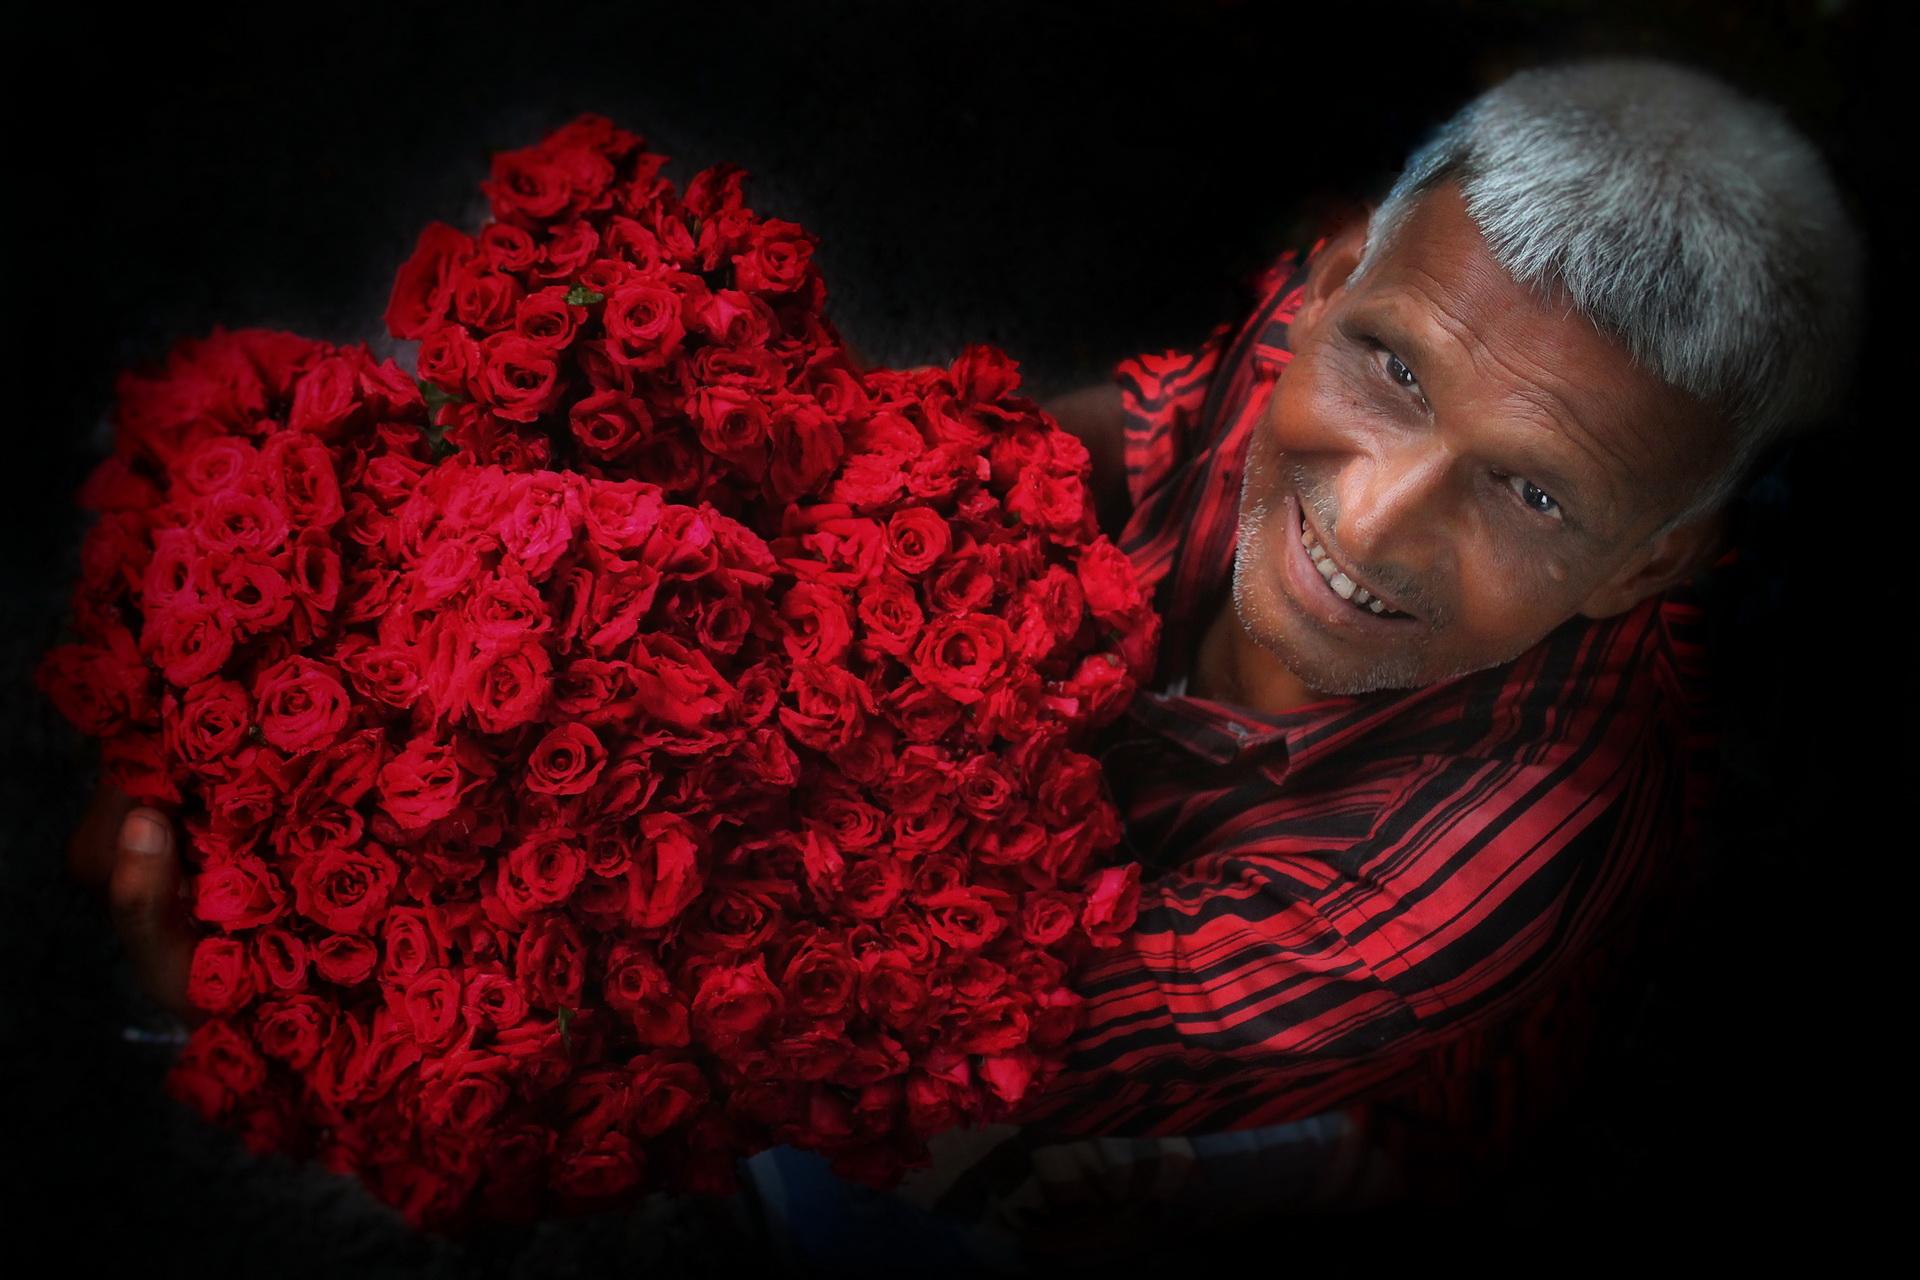 Portrait of a flower seller.